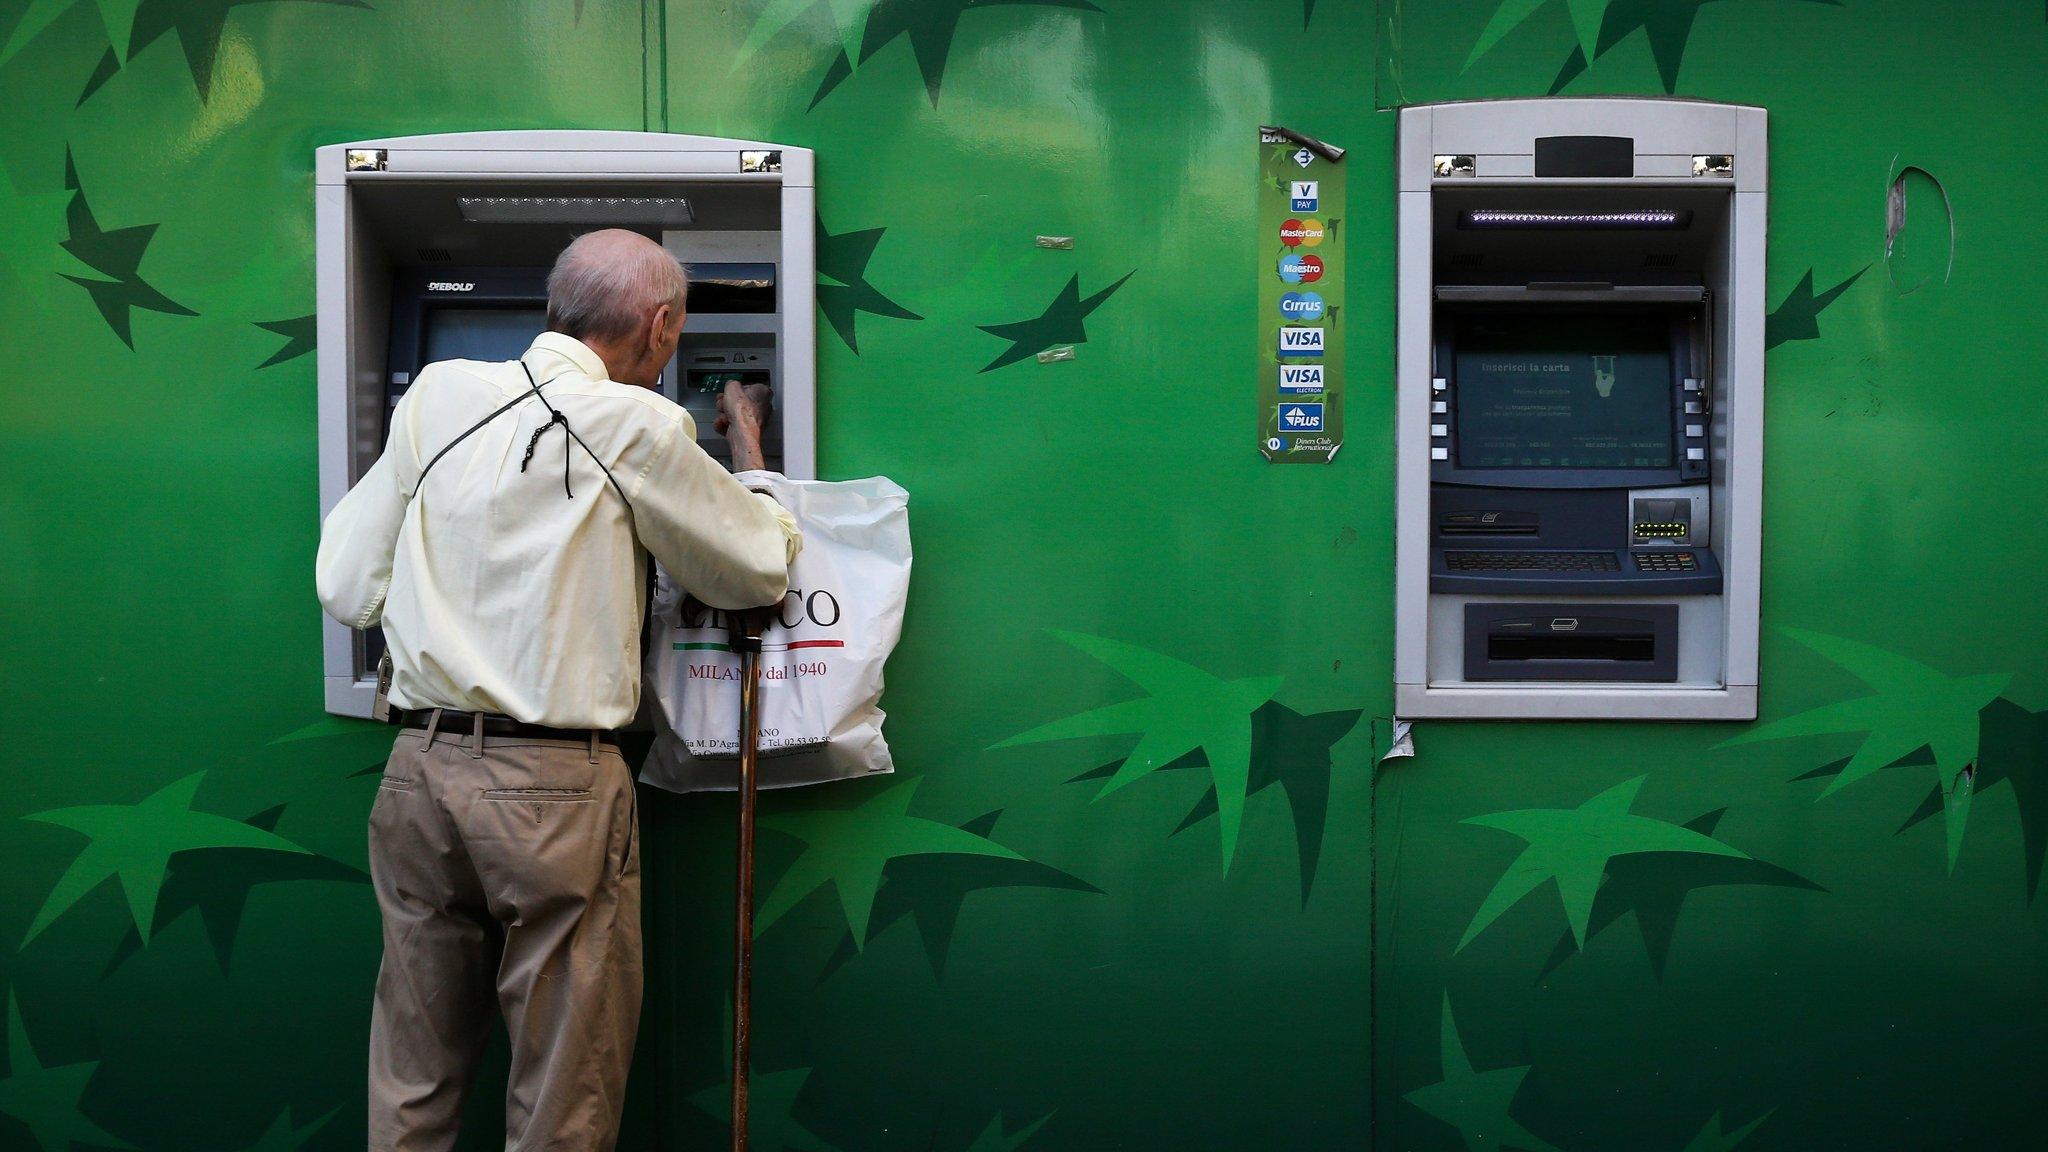 BNP Paribas beats expectations despite sluggish trading